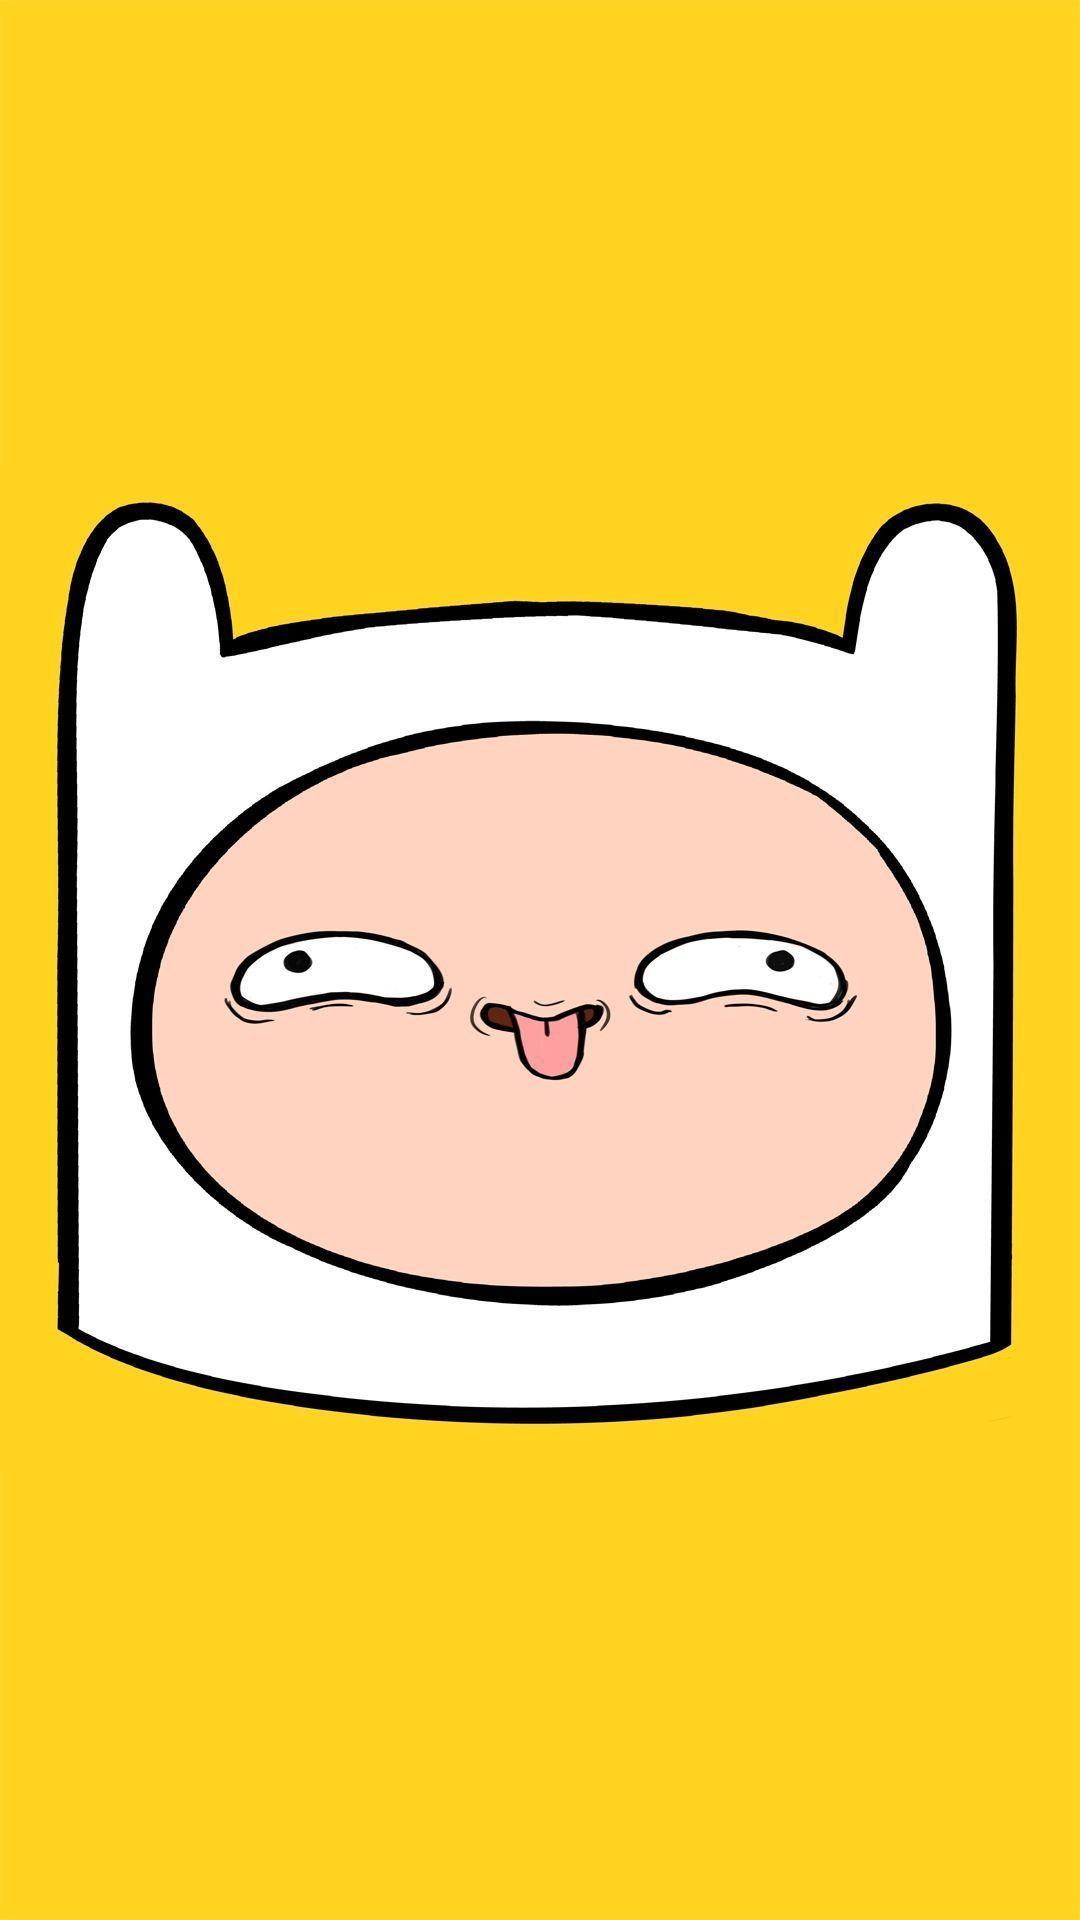 Finn And Jake Adventure Time Wallpaper Hd Cool Wallpapers Hd Adventure Time Wallpaper Adventure Time Iphone Wallpaper Jake Adventure Time